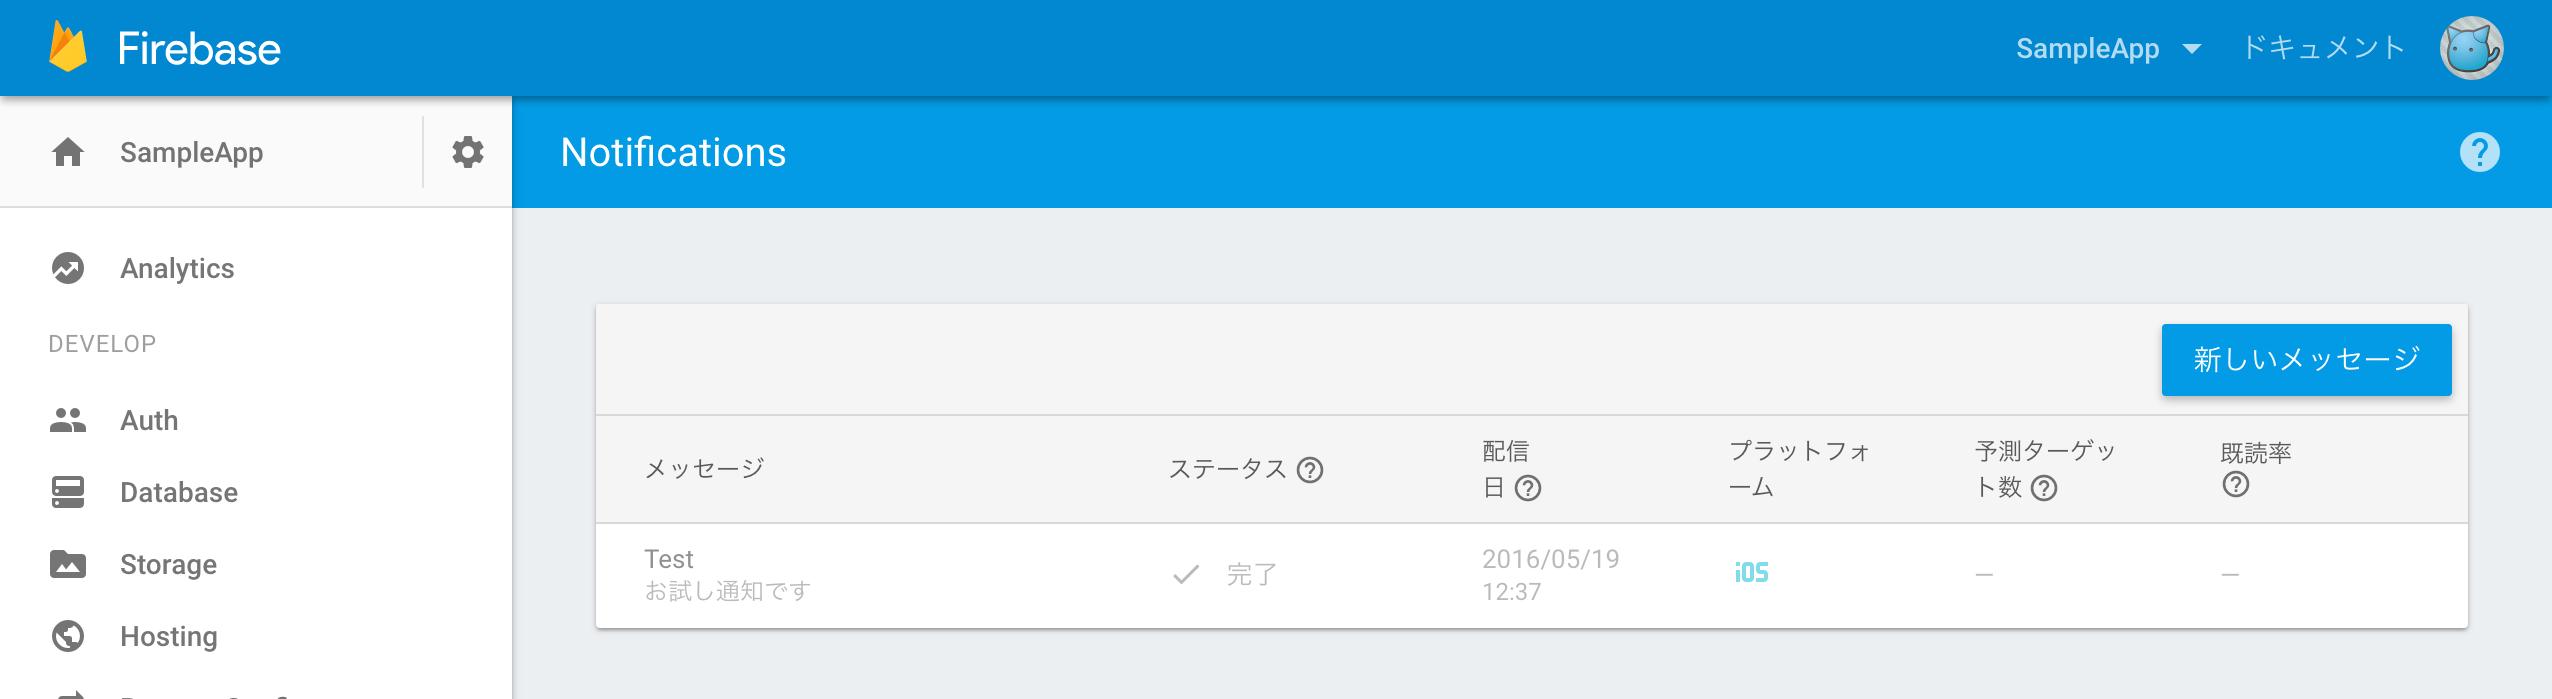 firebase-ios-notify-11